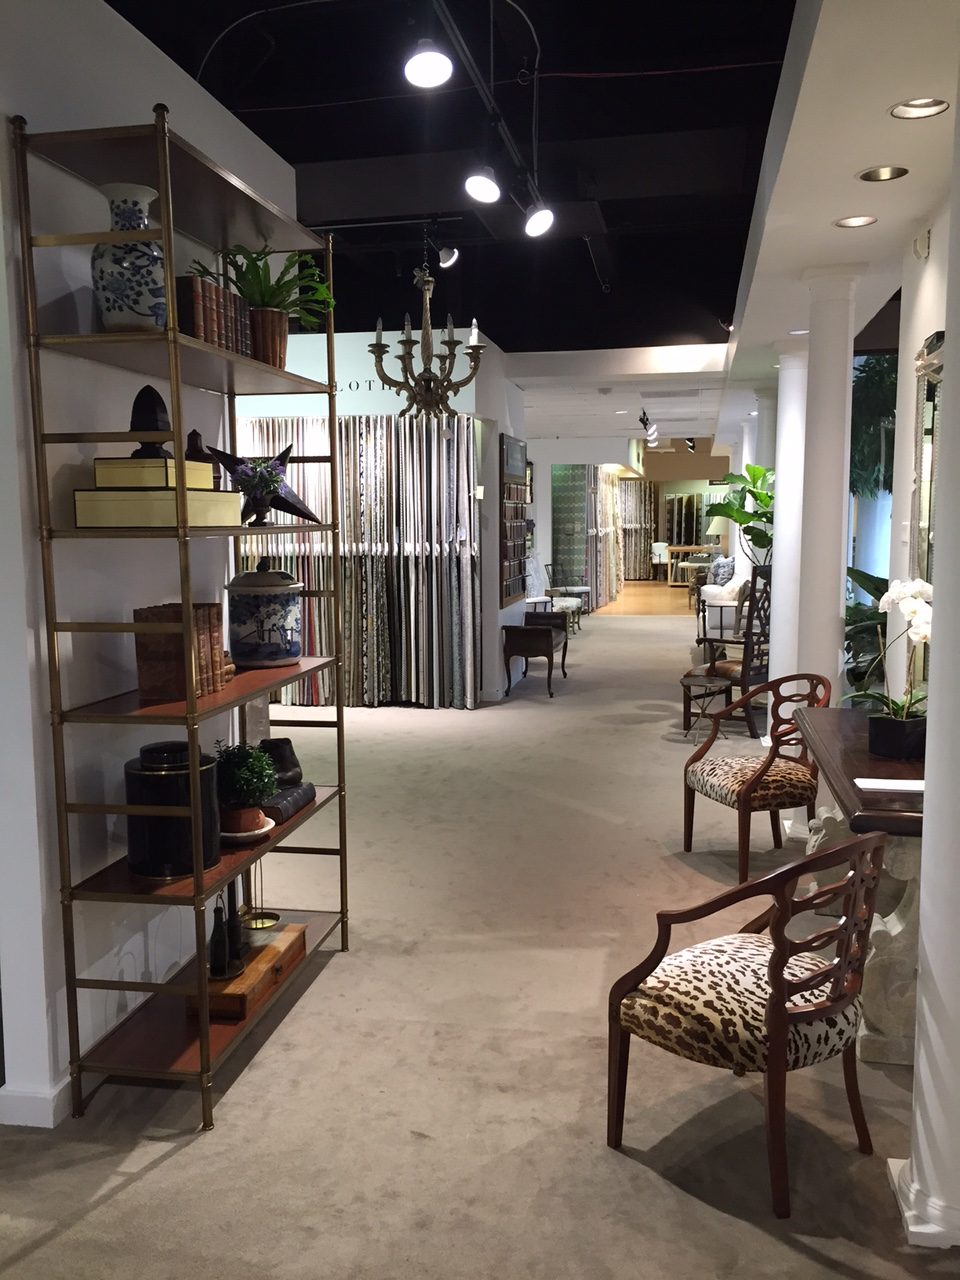 AW showroom 7.2015 c.jpg